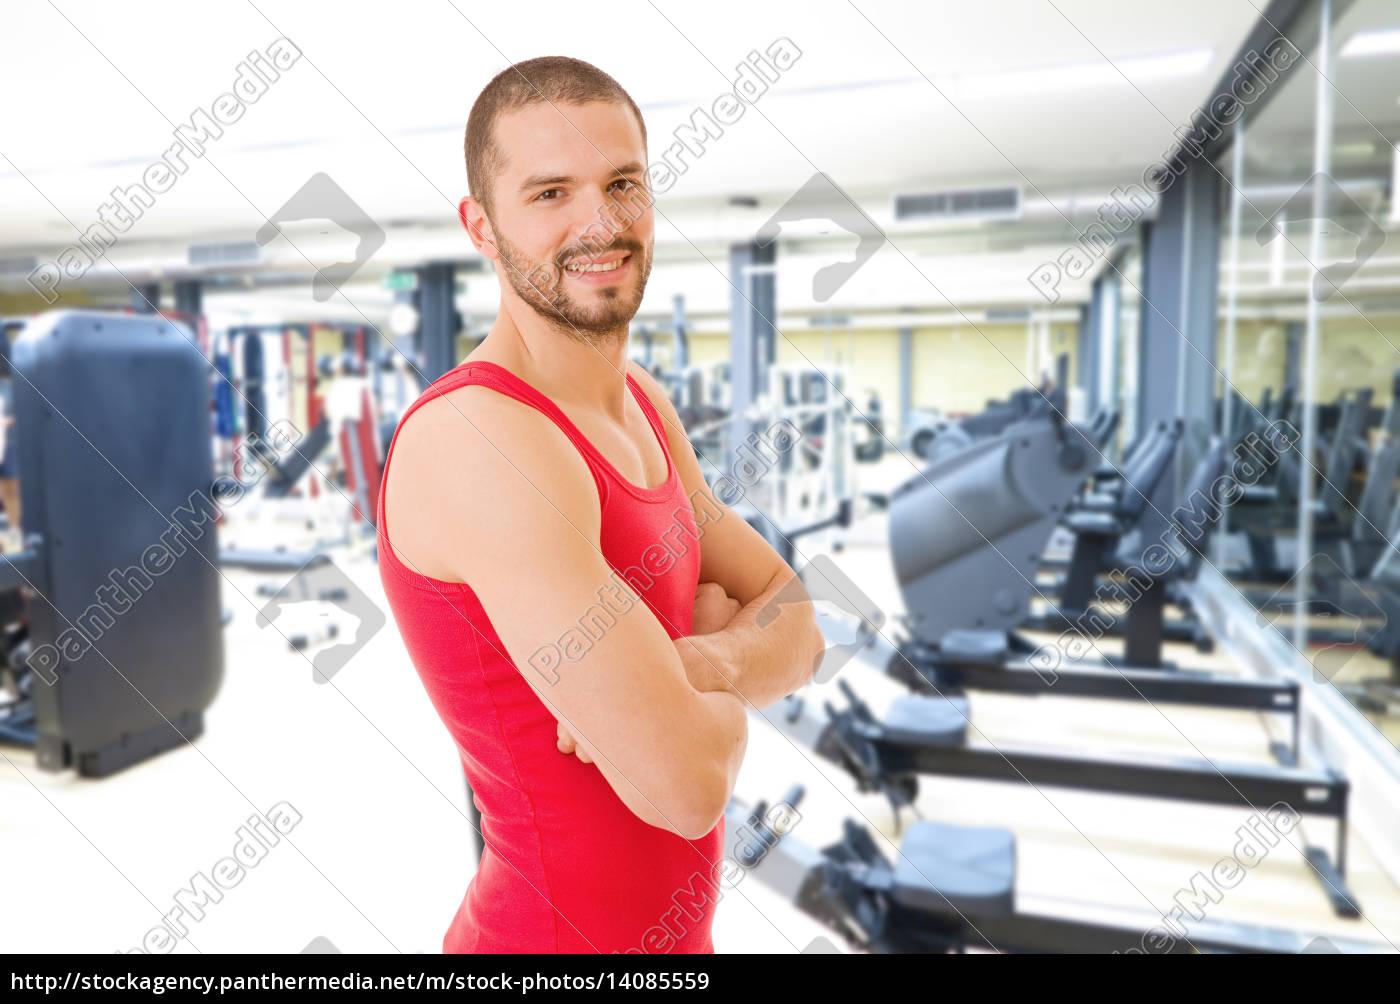 man, at, the, gym - 14085559